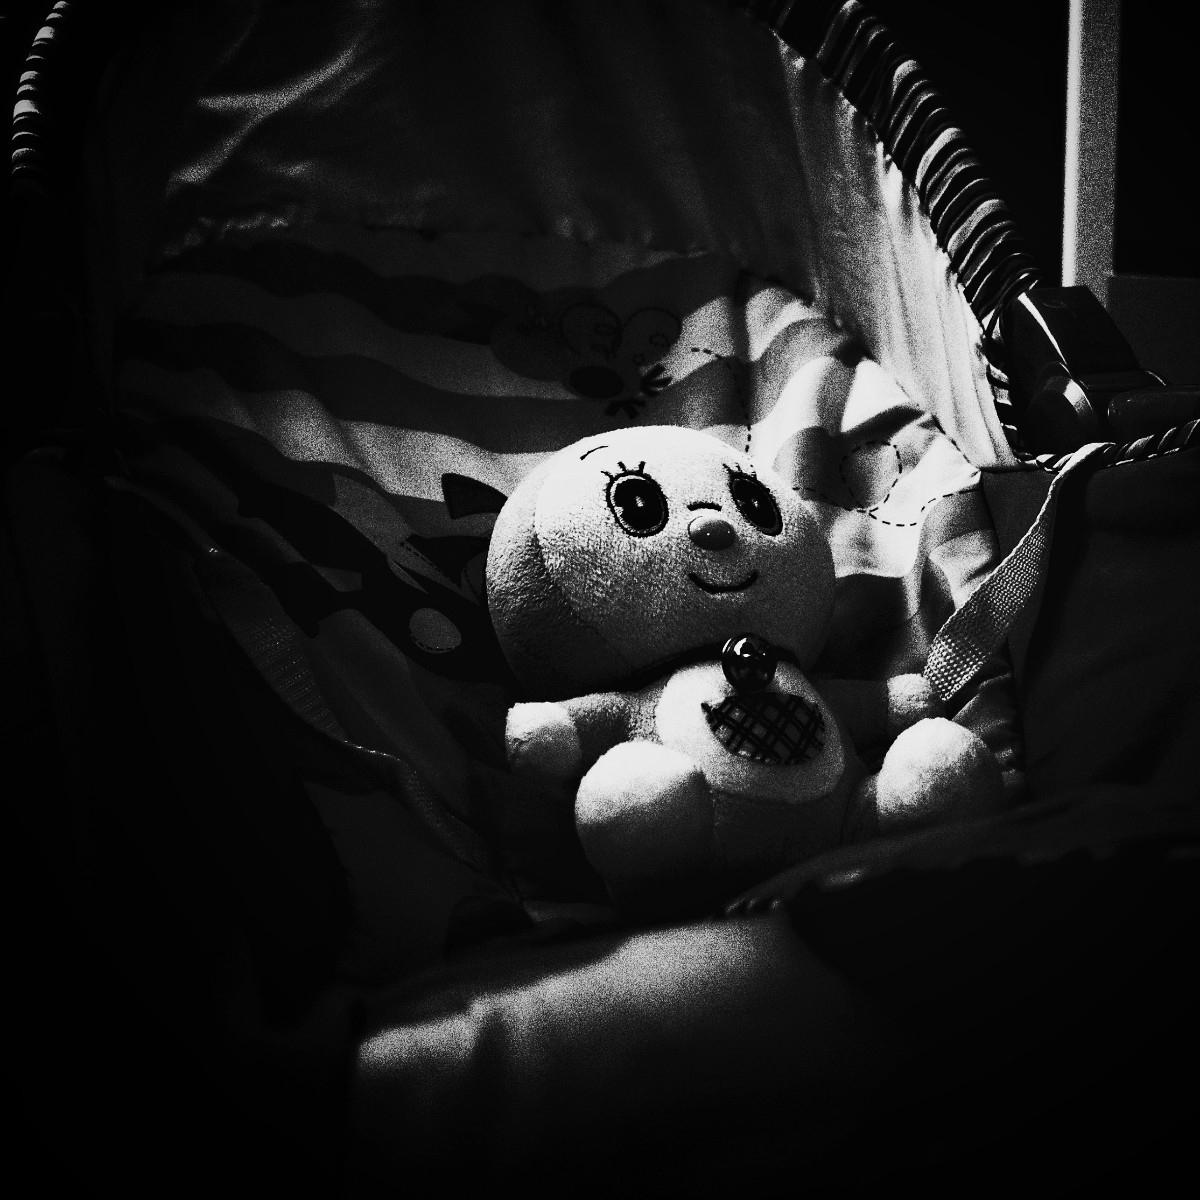 childhood dream - blackandwhite - fadi_h | ello